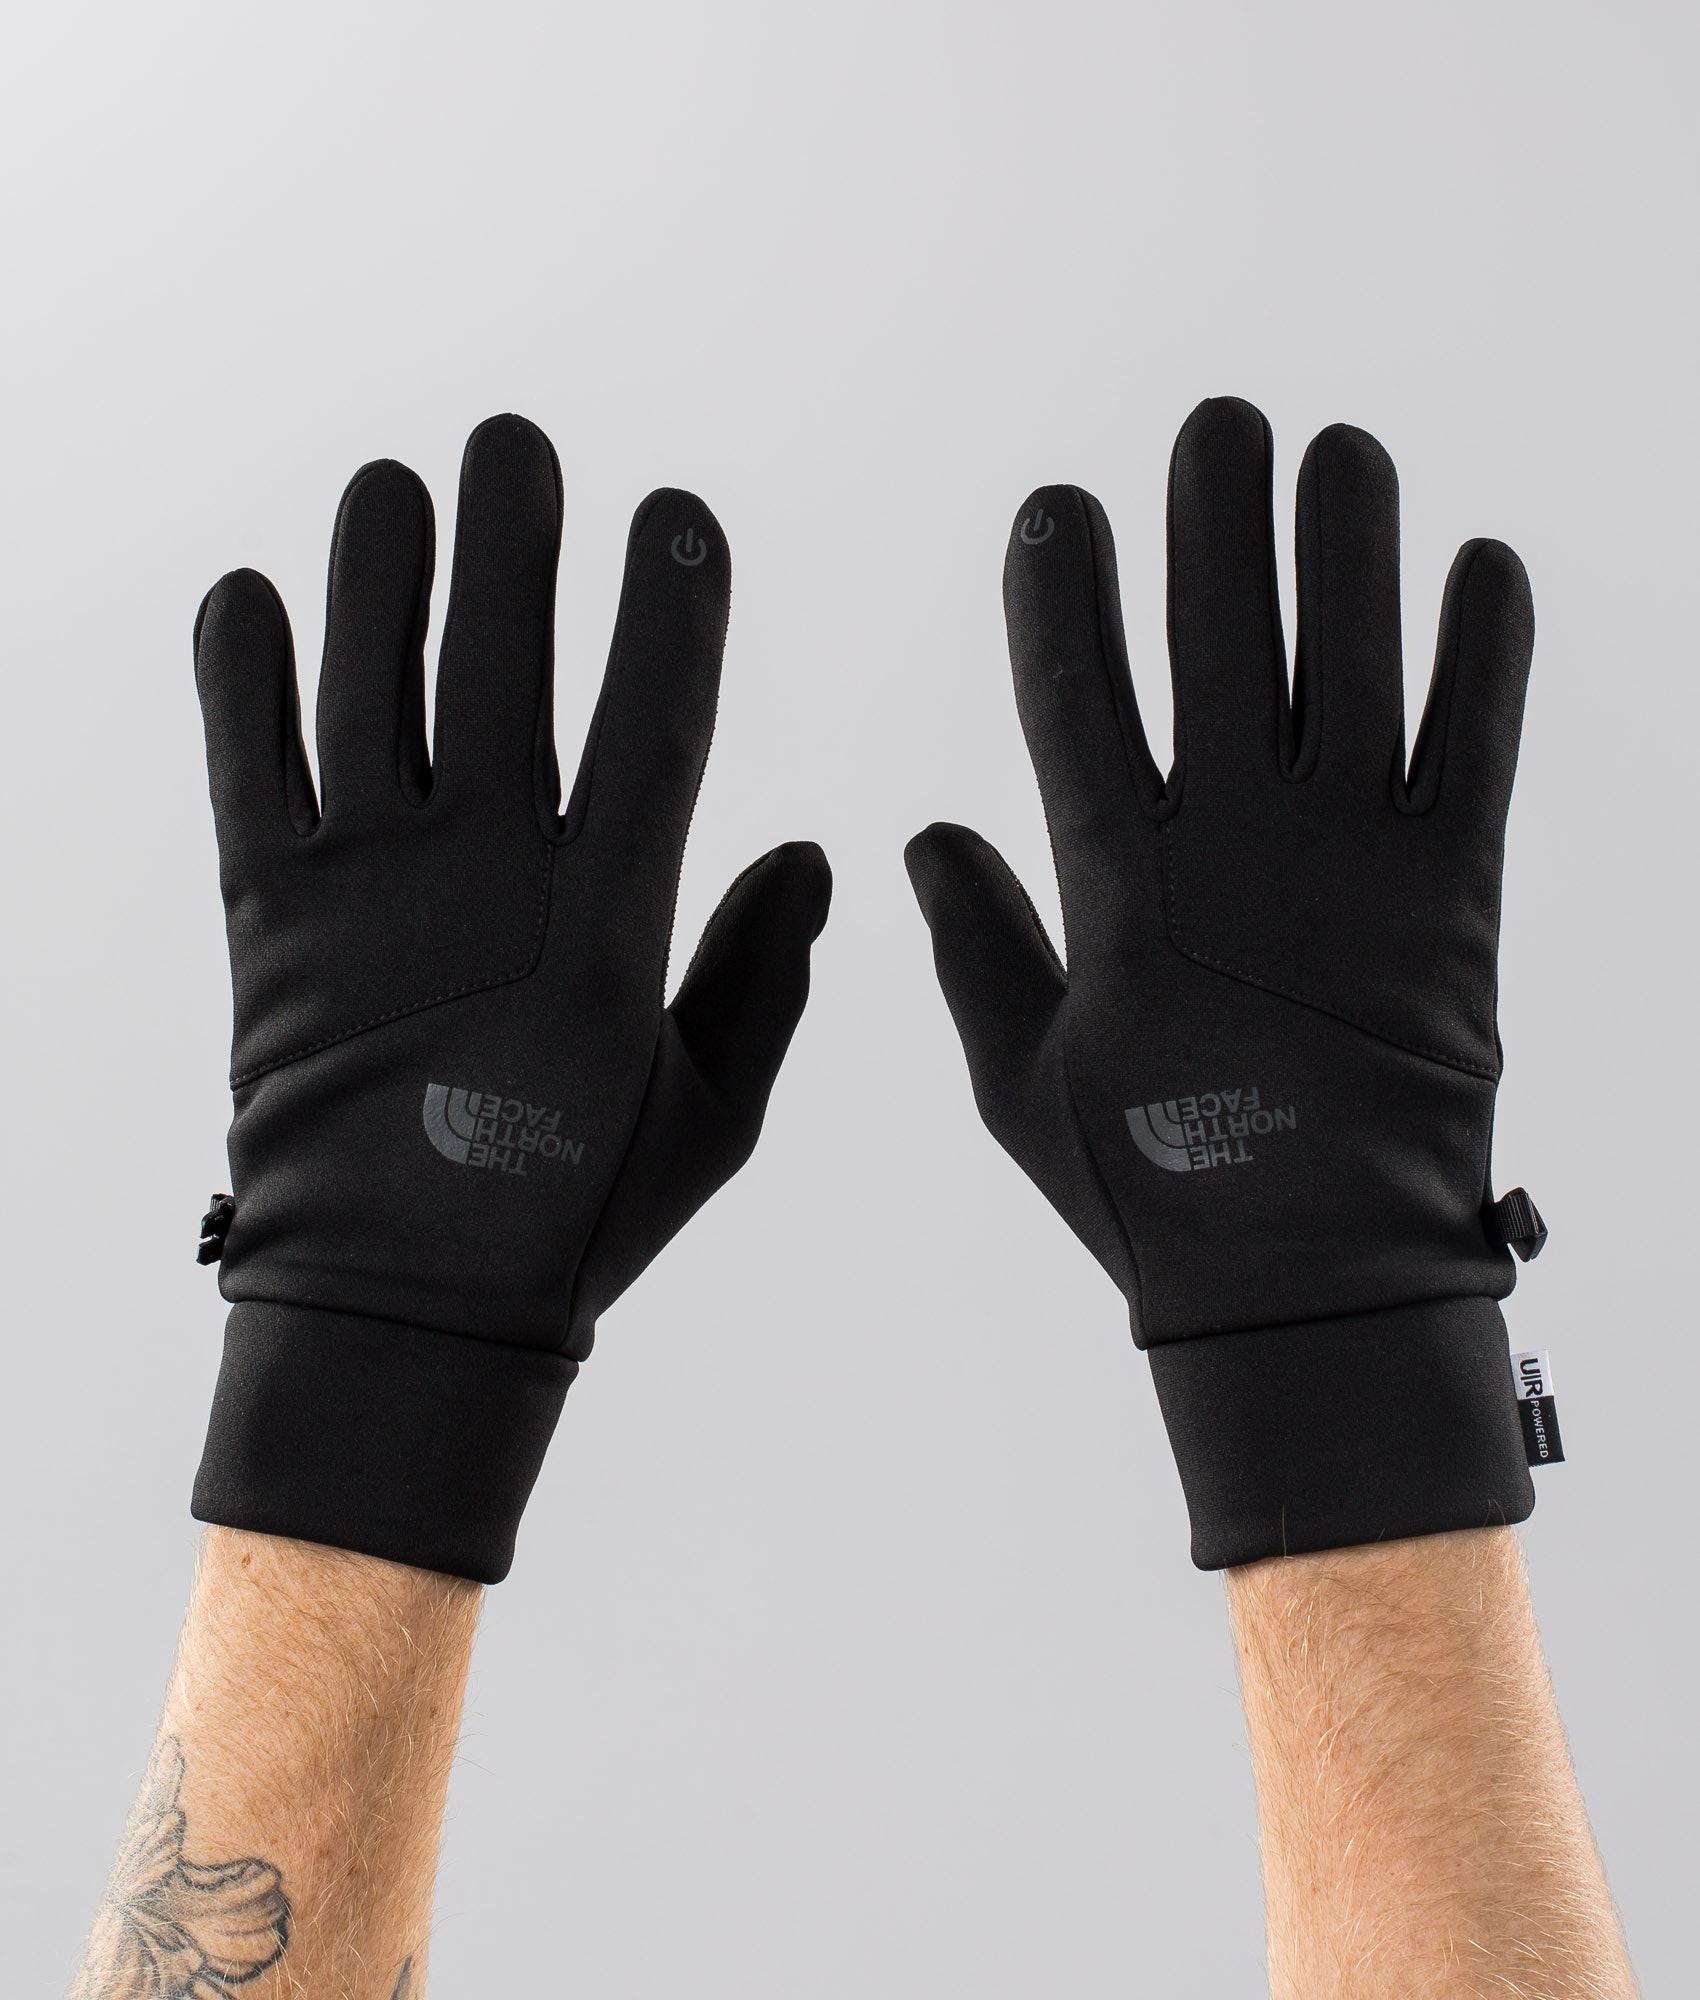 ba60afbcc8ef8 The North Face Etip Ski Gloves Tnf Black - Ridestore.com